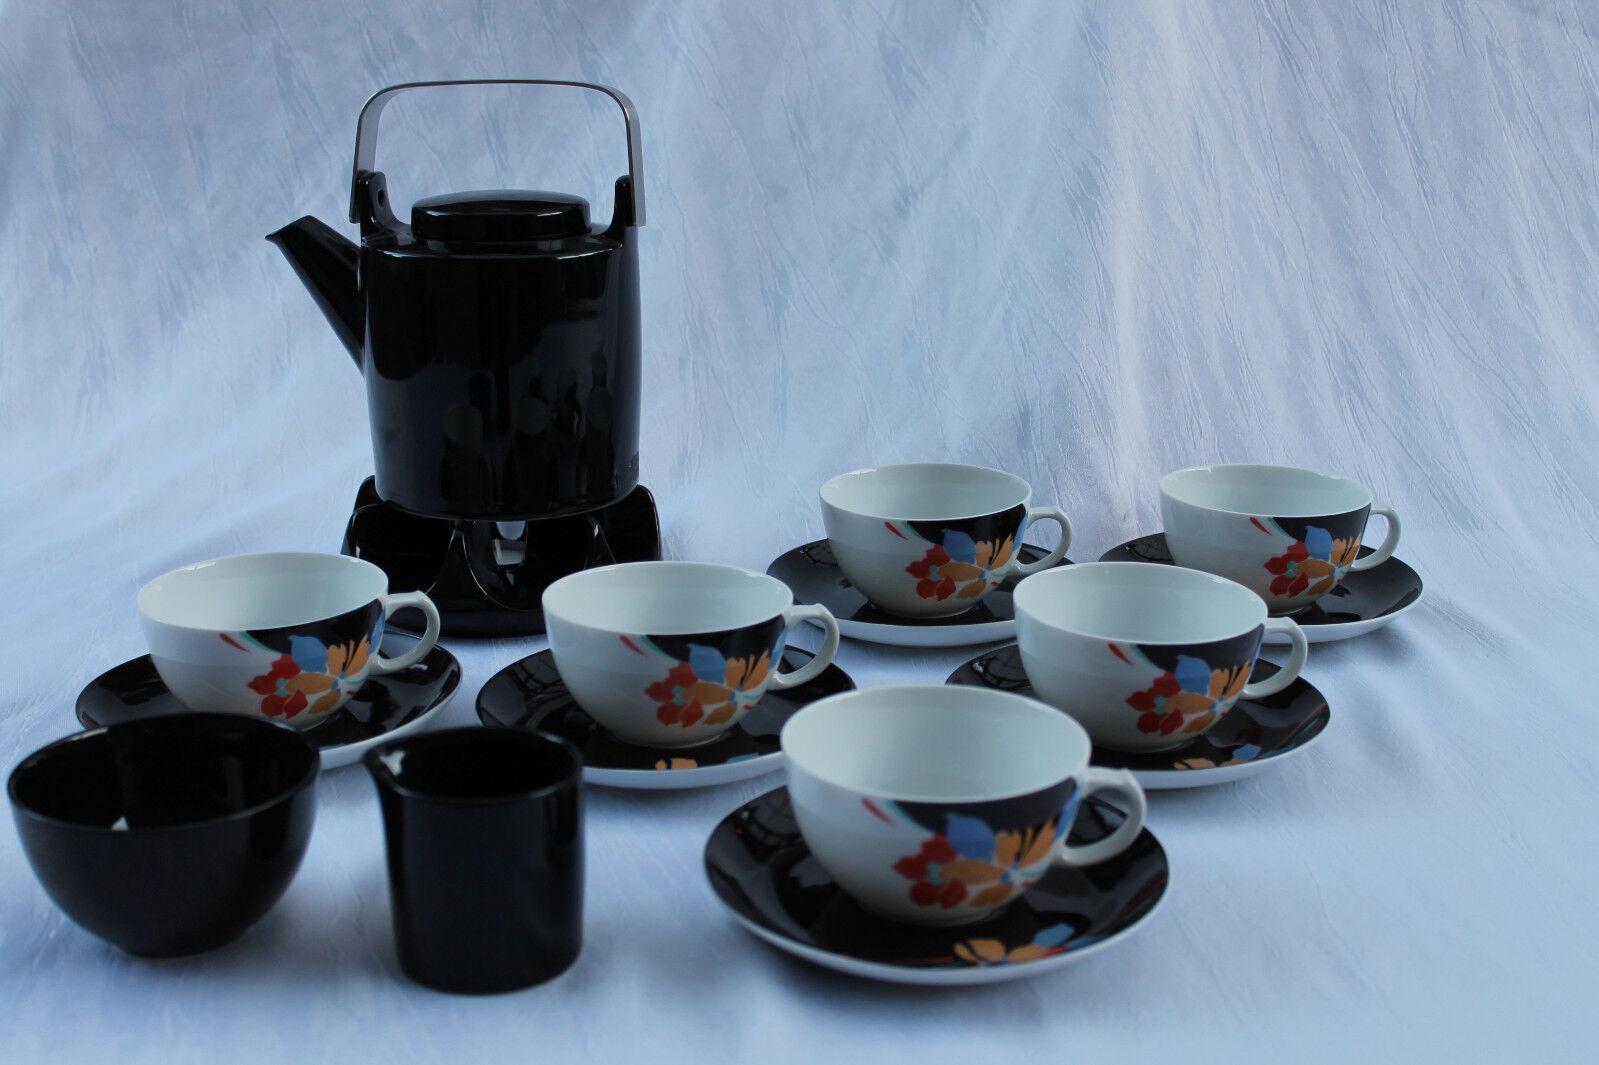 Arzberg Porzellan Teeservice Teekanne Stövchen Tassen Untertassen 6 6 6 Pers 16 tgl. 81b3e5